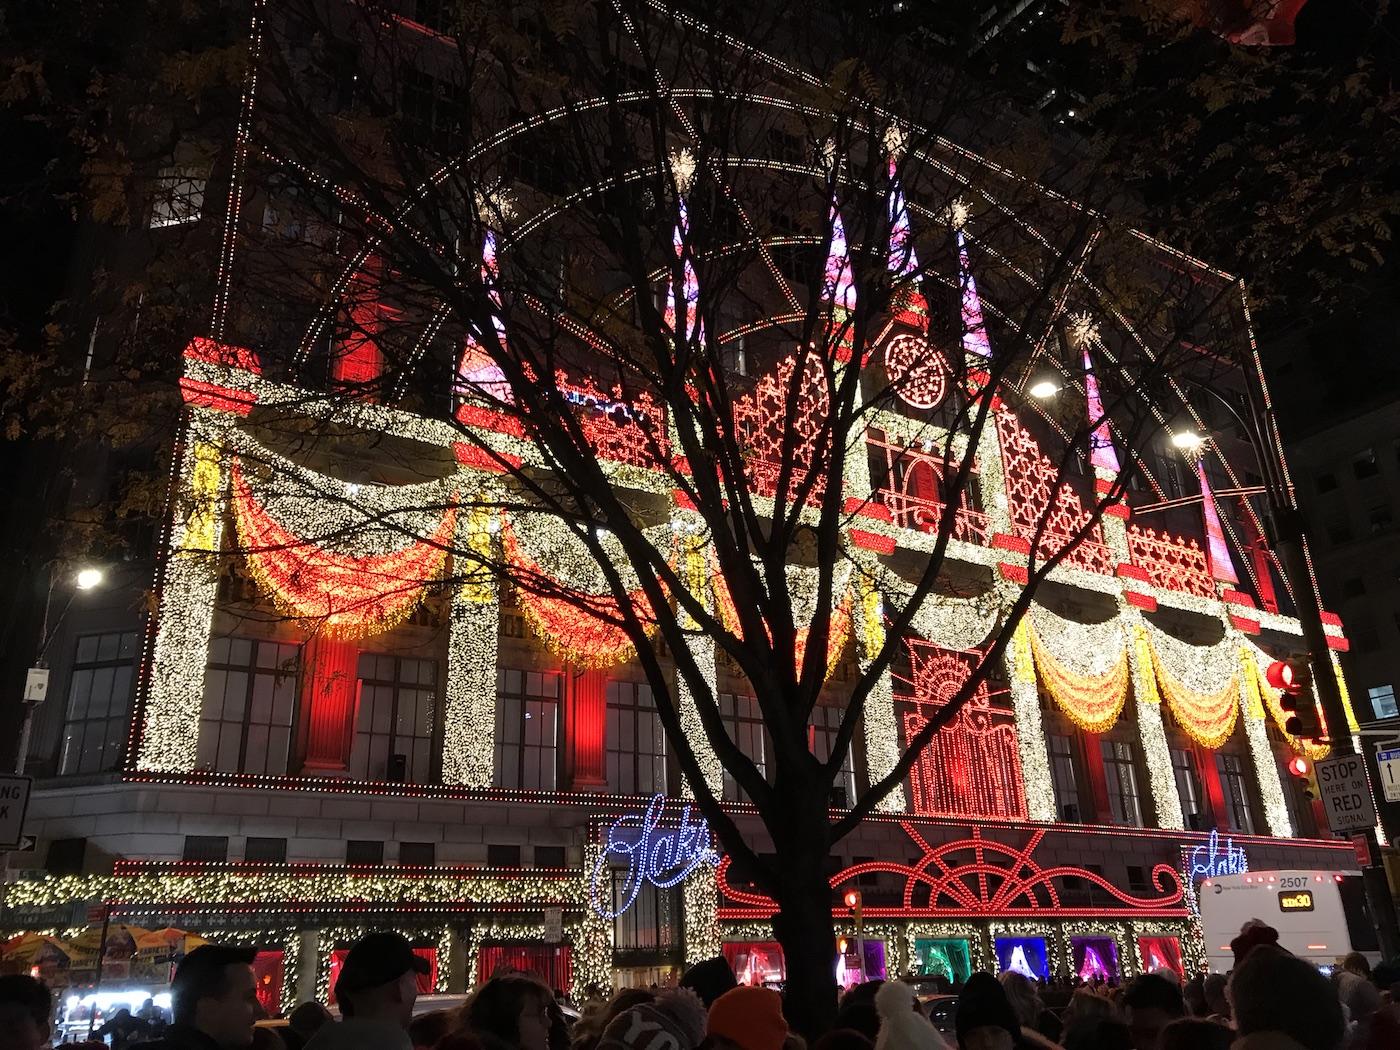 Kerst in New York saks